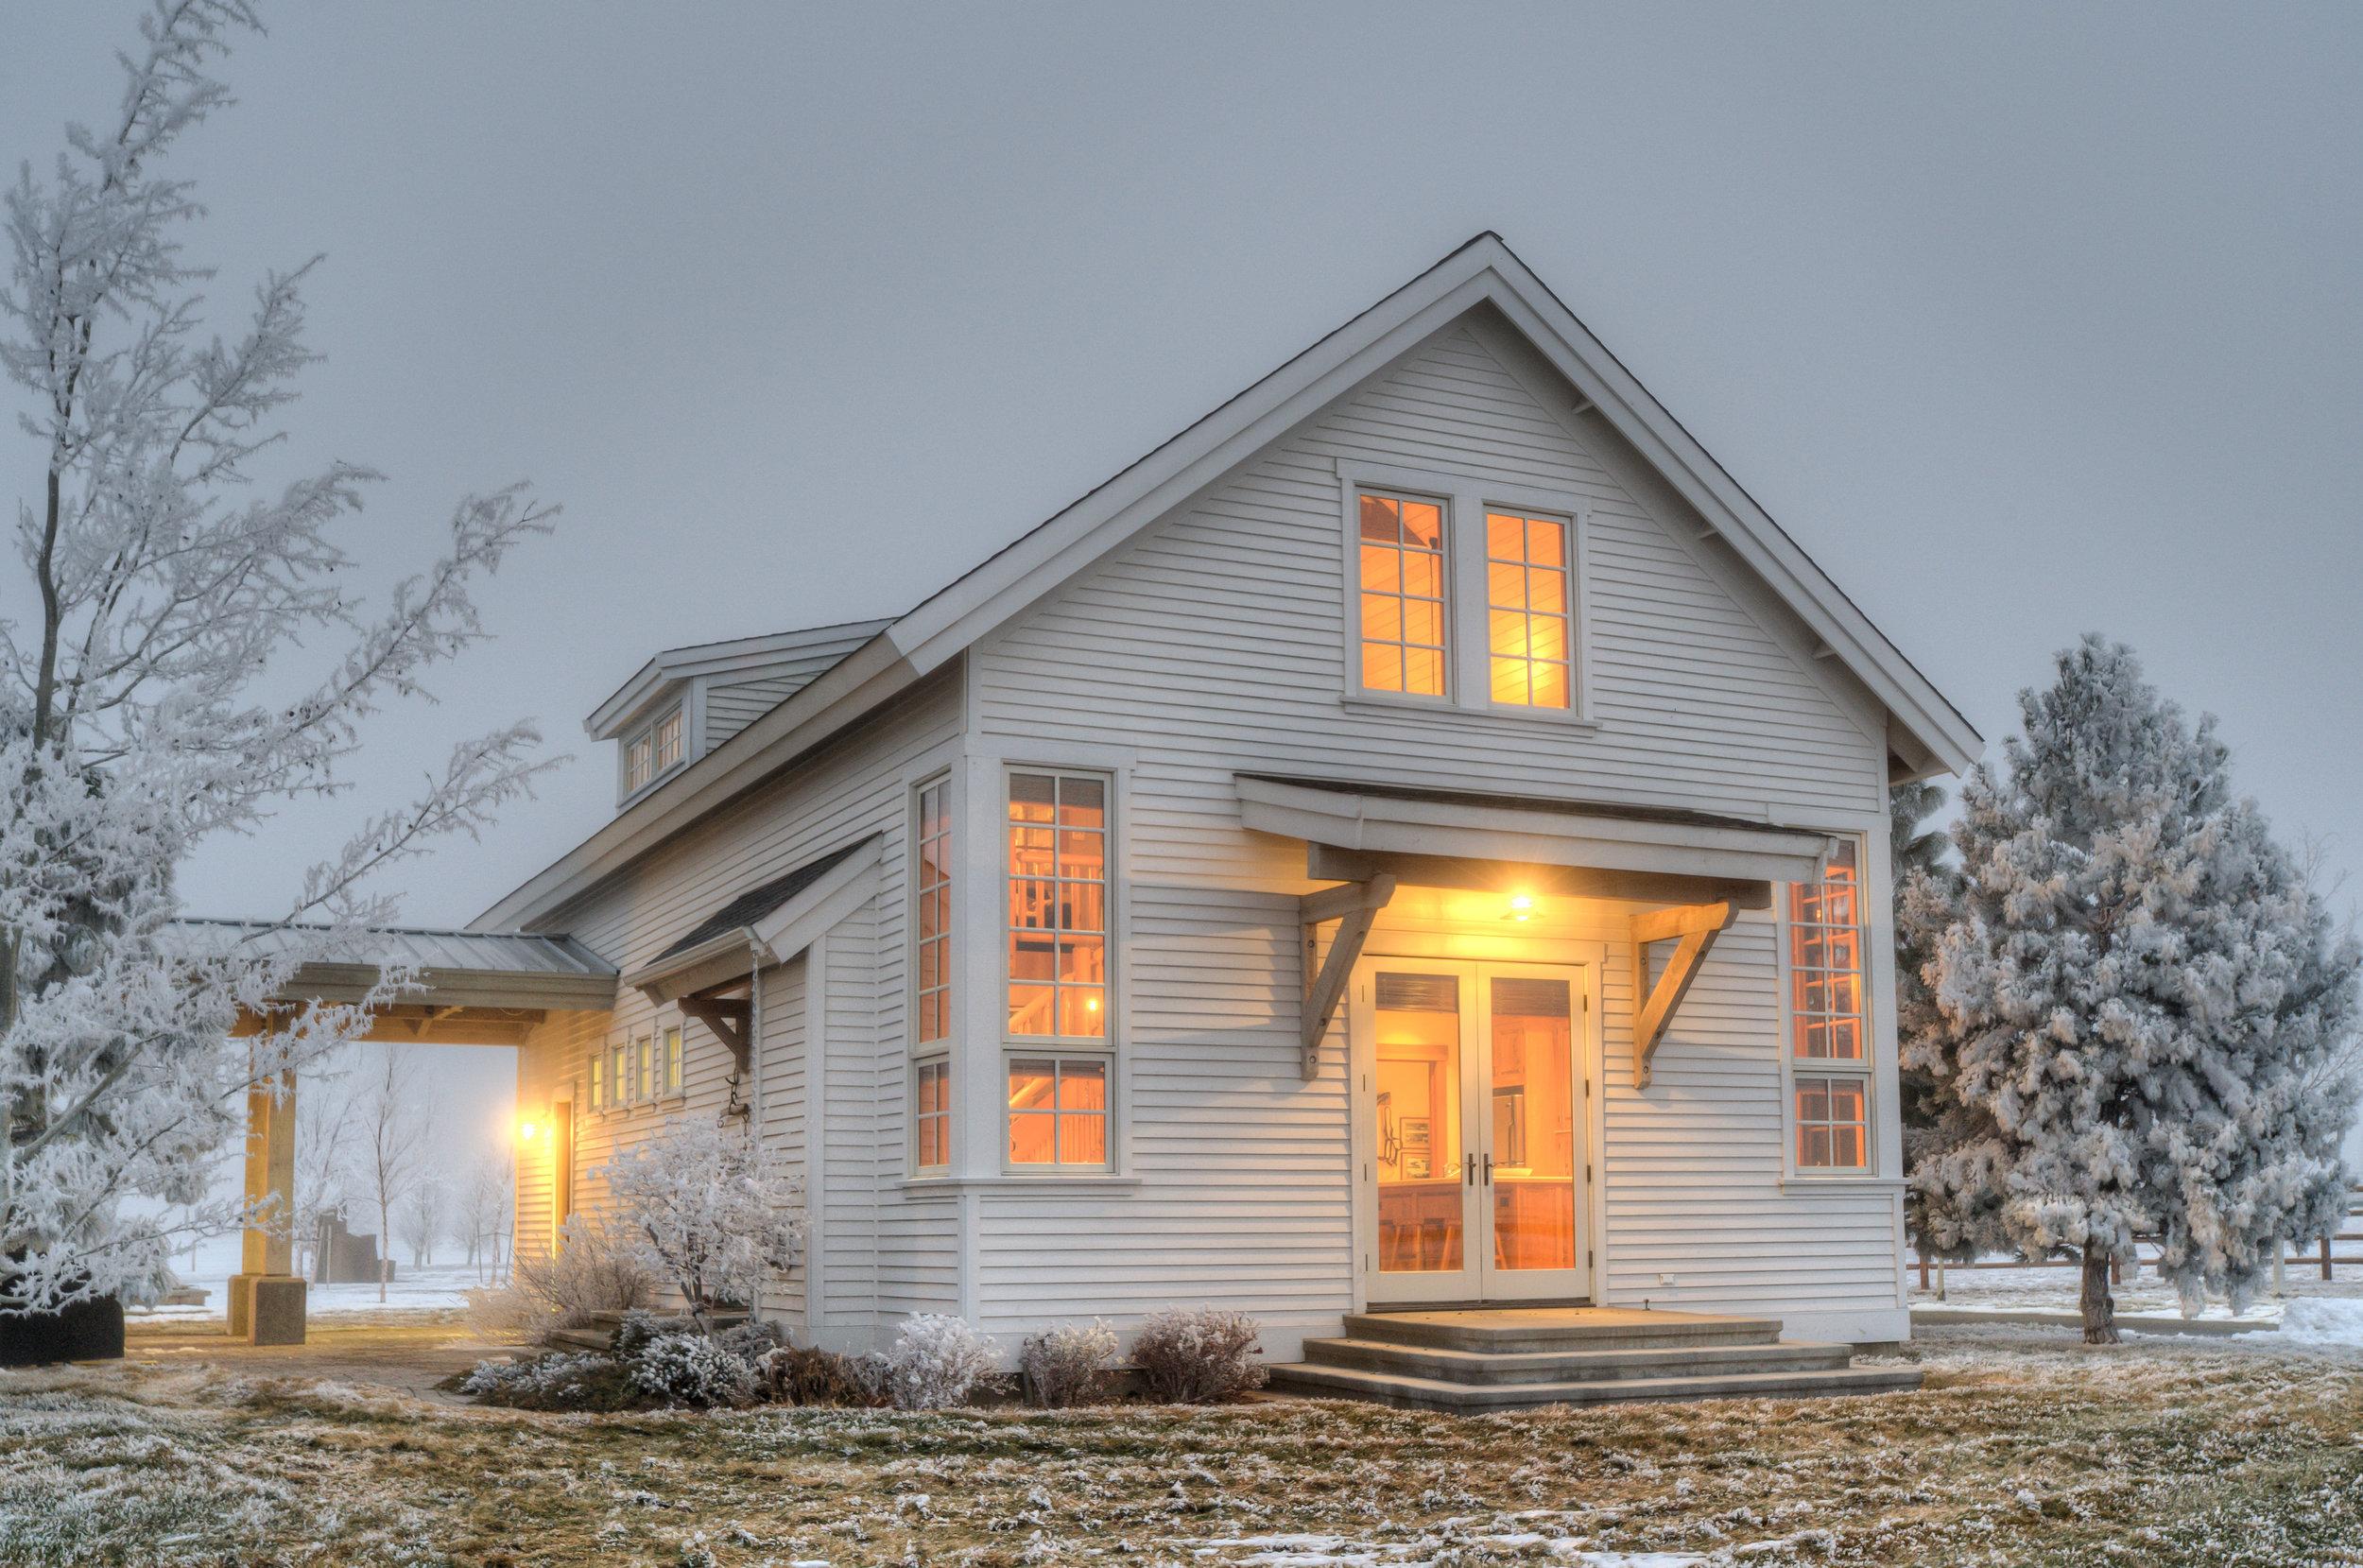 1DNWA_Ellensburg_house-by-LHenning-large-104.jpg